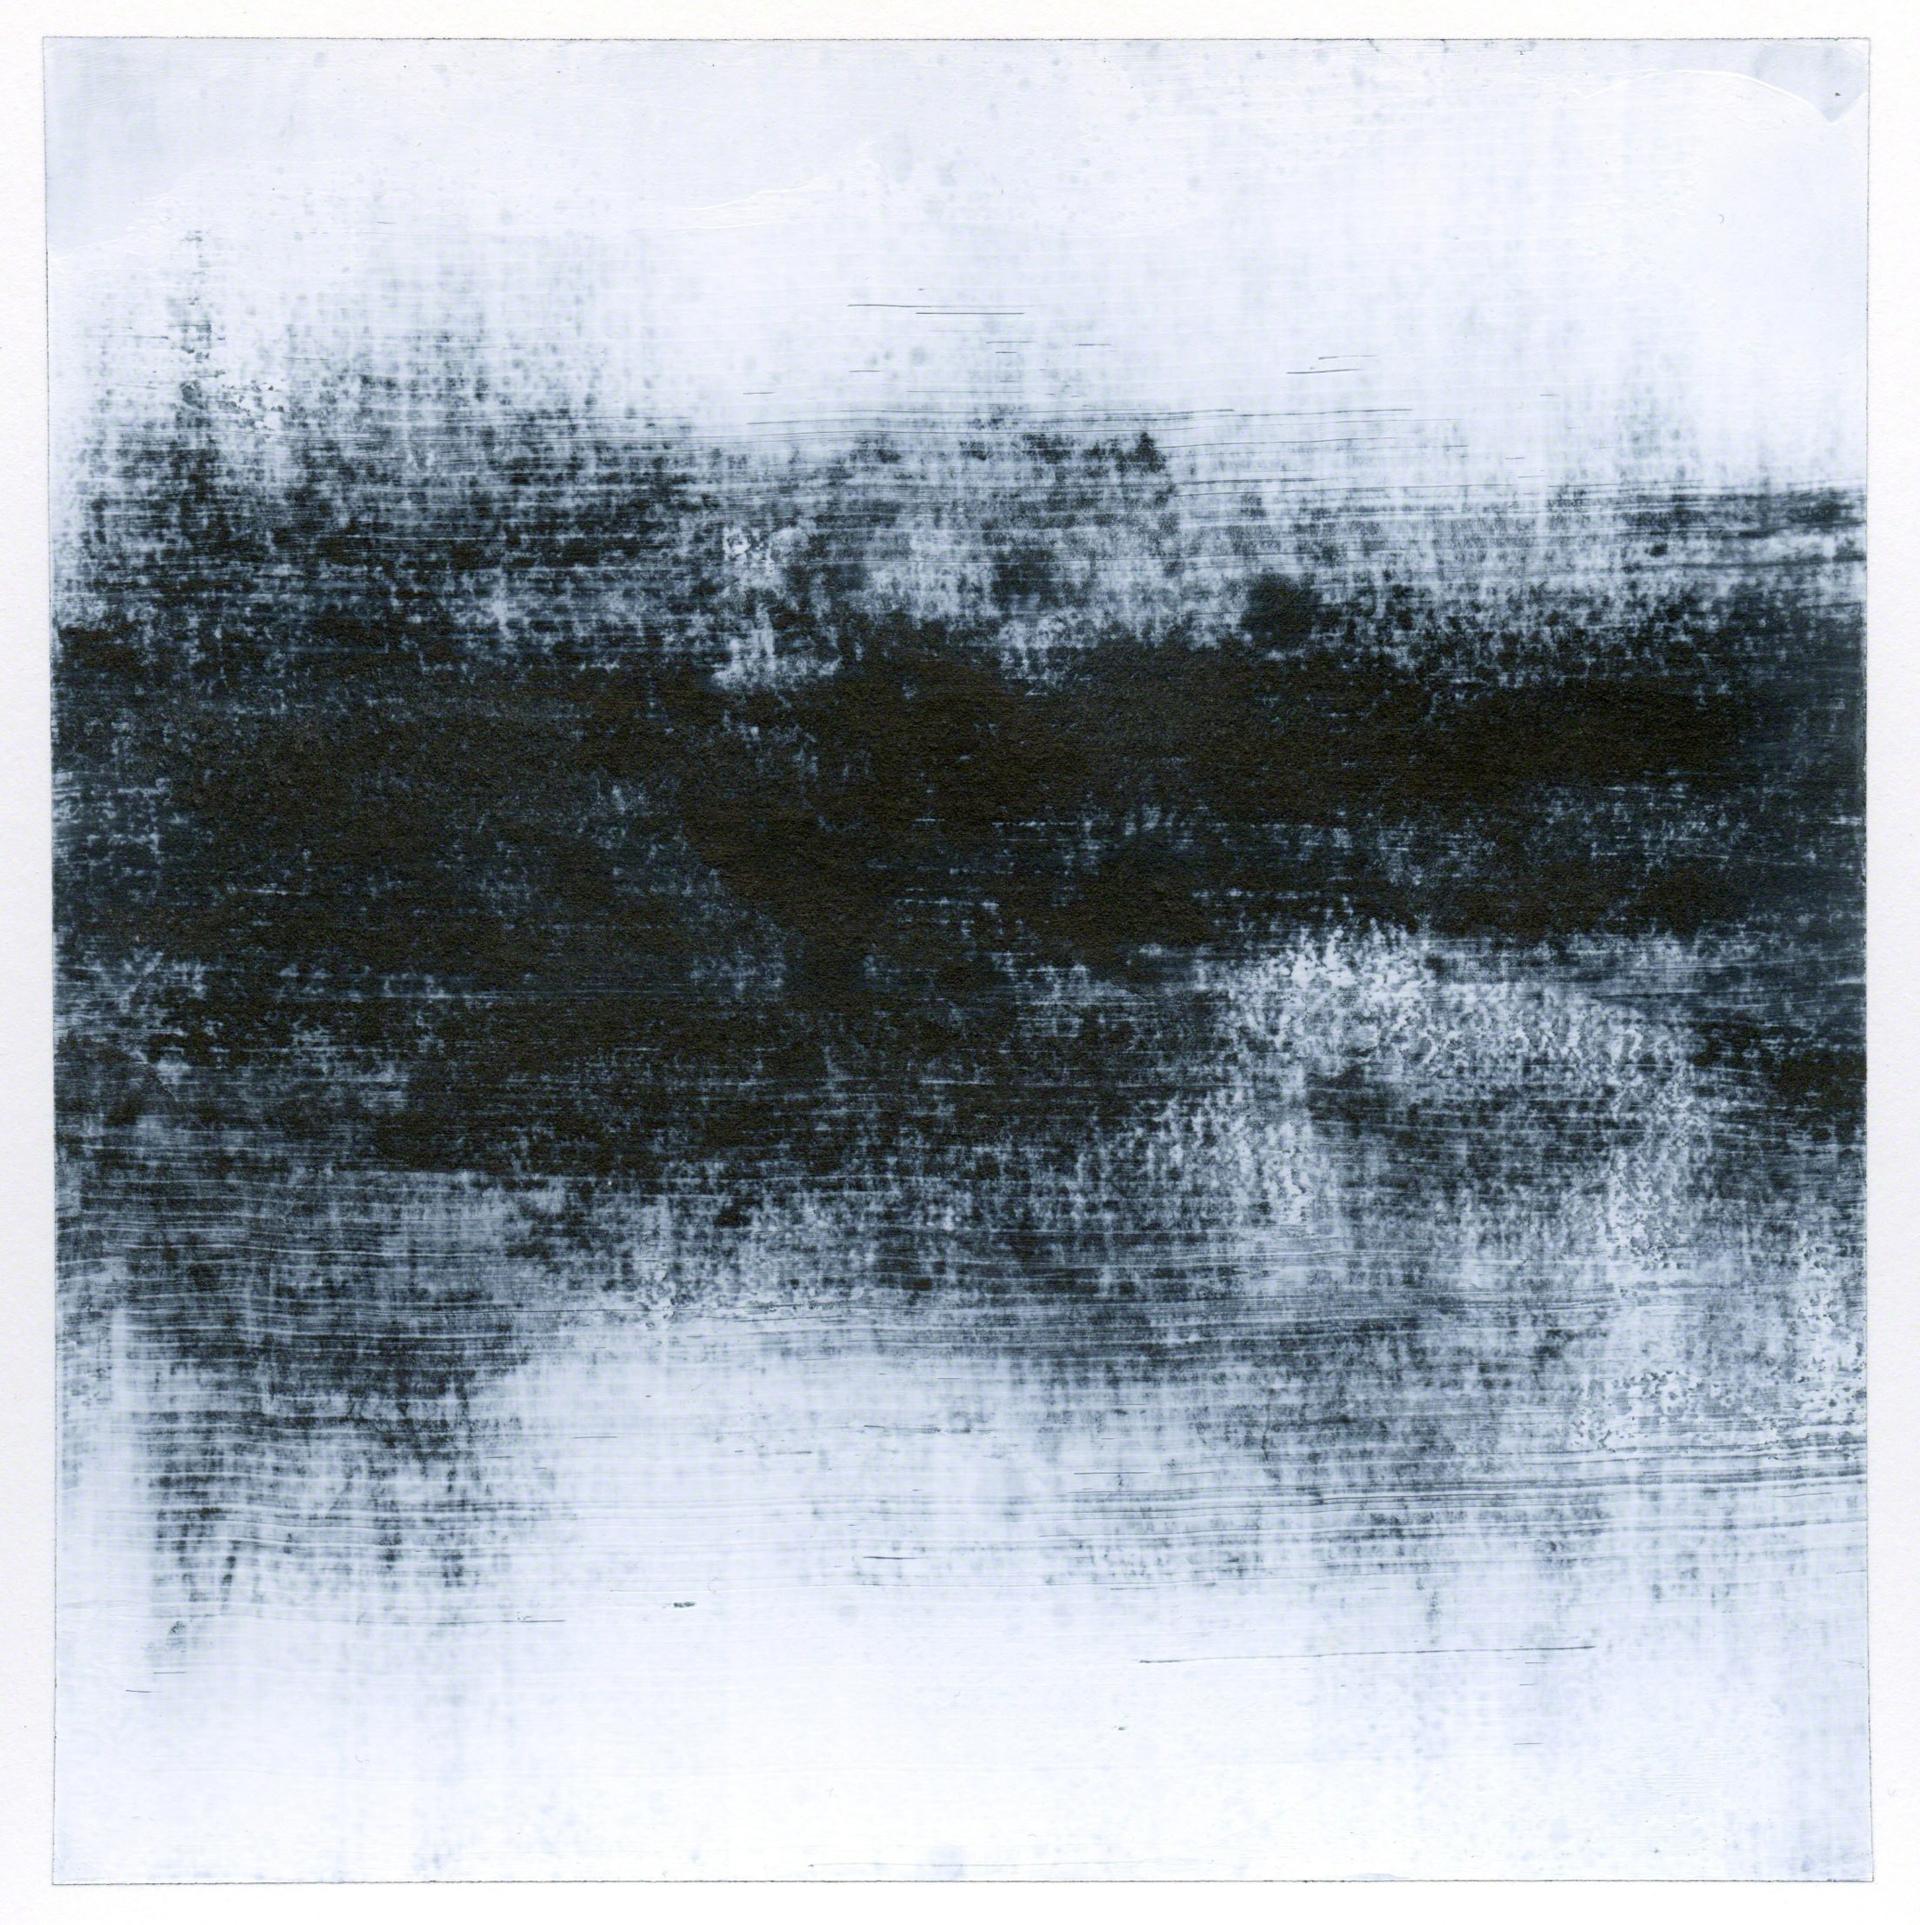 Untitled (17.11.02) by Paul Moran